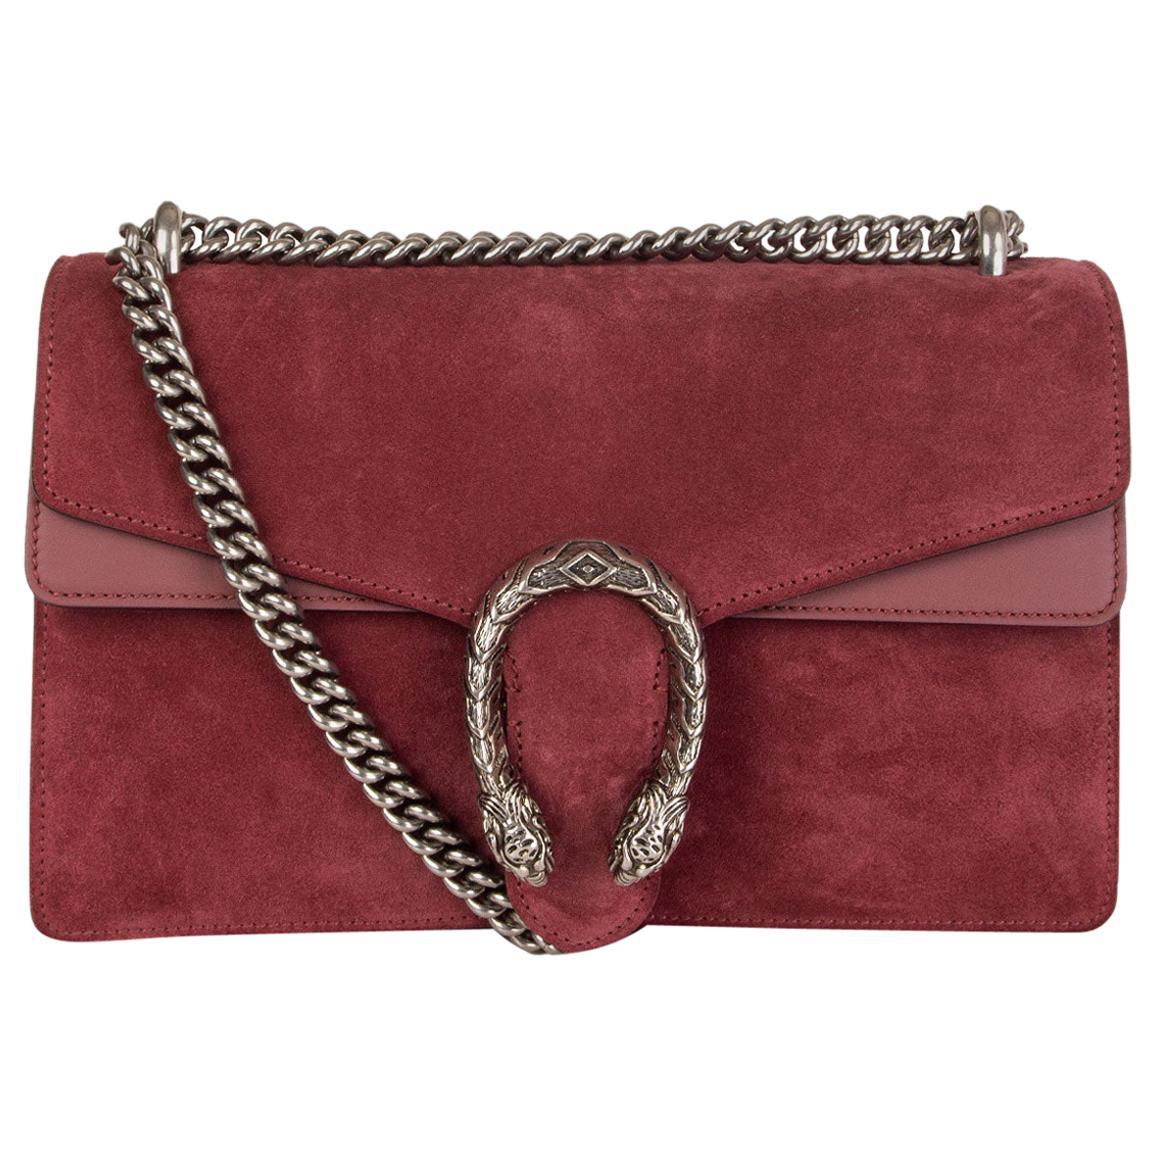 GUCCI burgundy suede DIONYSUS SMALL Shoulder Bag